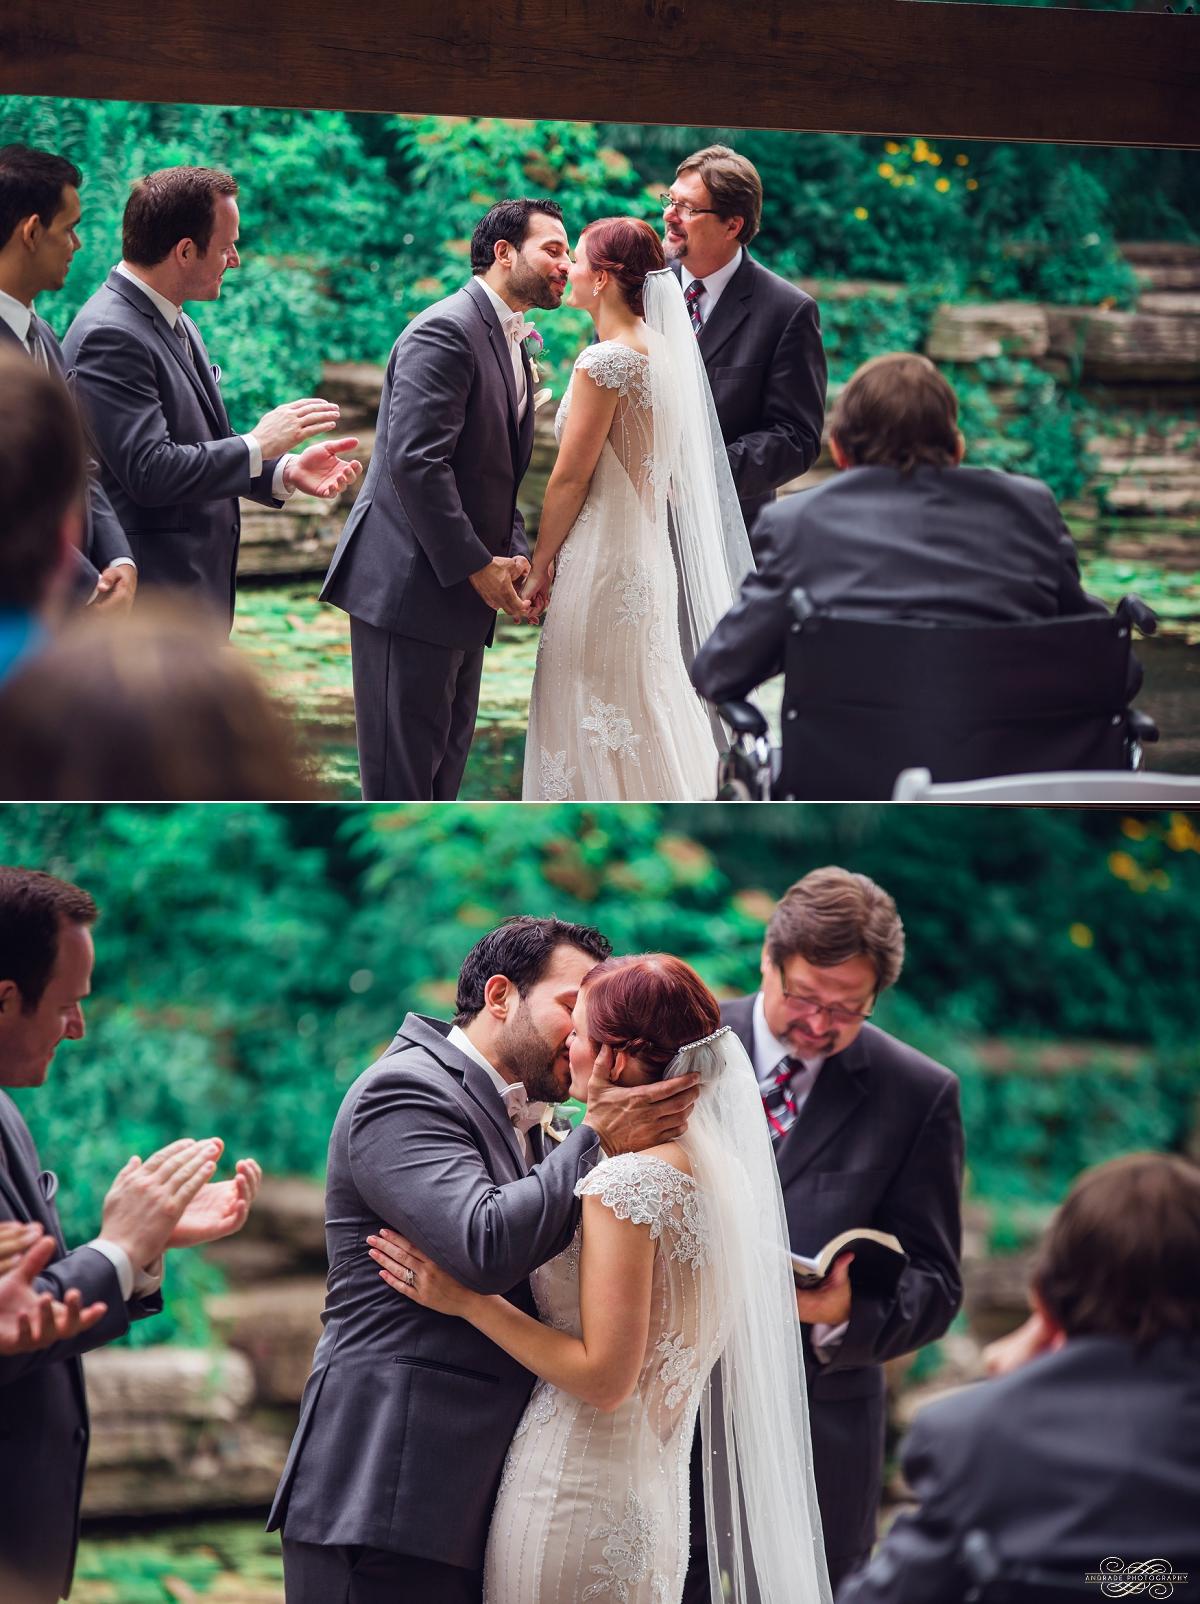 Jillian & Felix Chicago Wedding Photography at Oak & Char Trump Tower and Chicago Athletic Association_0019.jpg